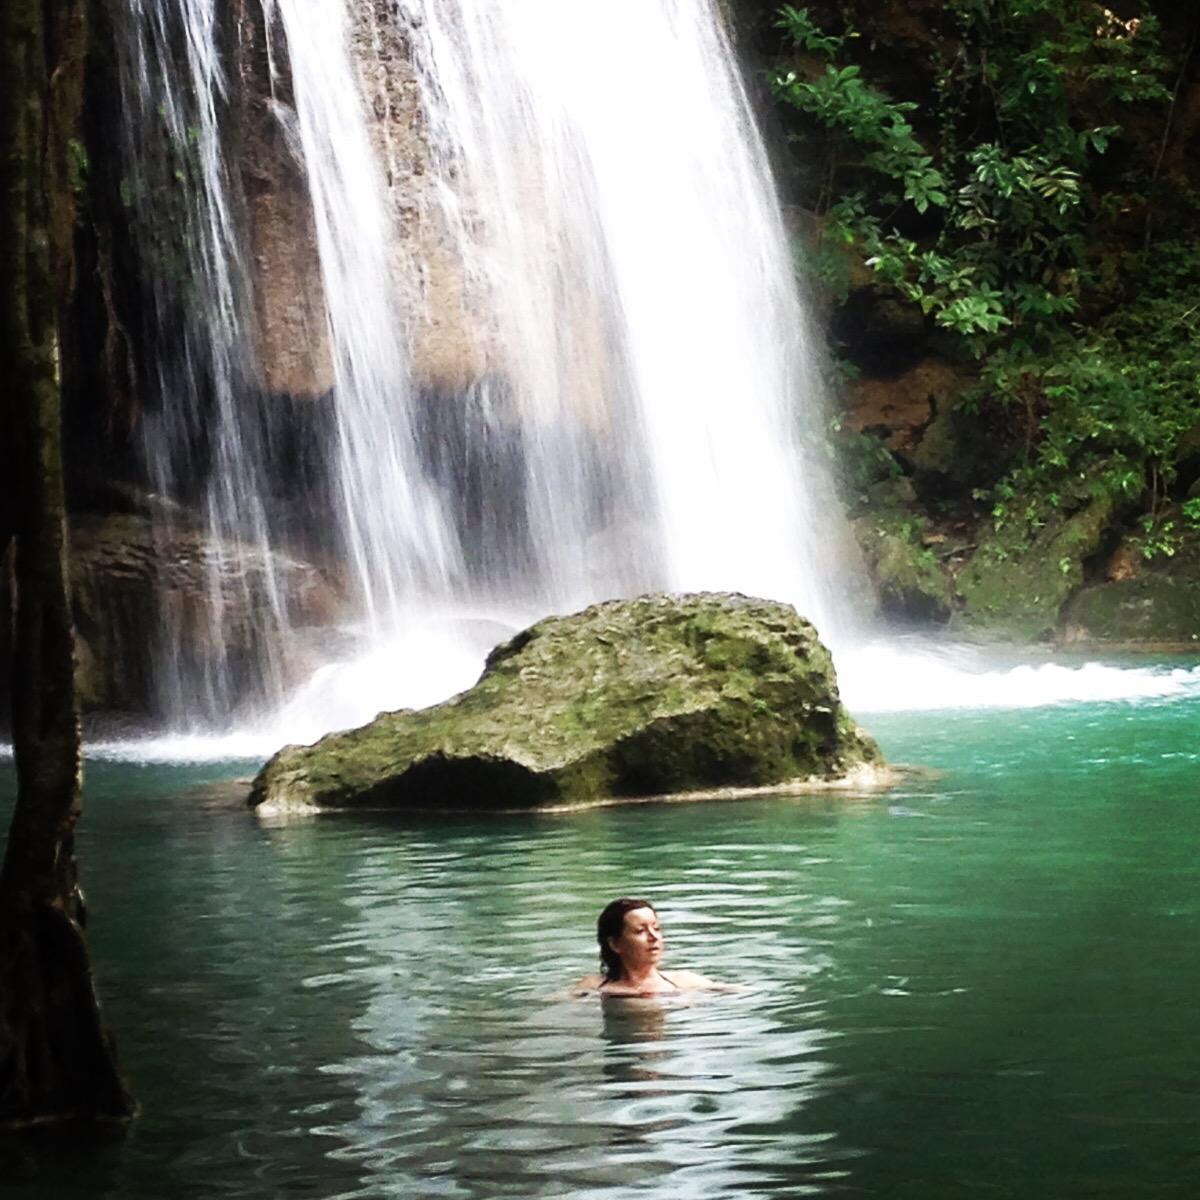 hiking-swimming-erewan-falls-thailand